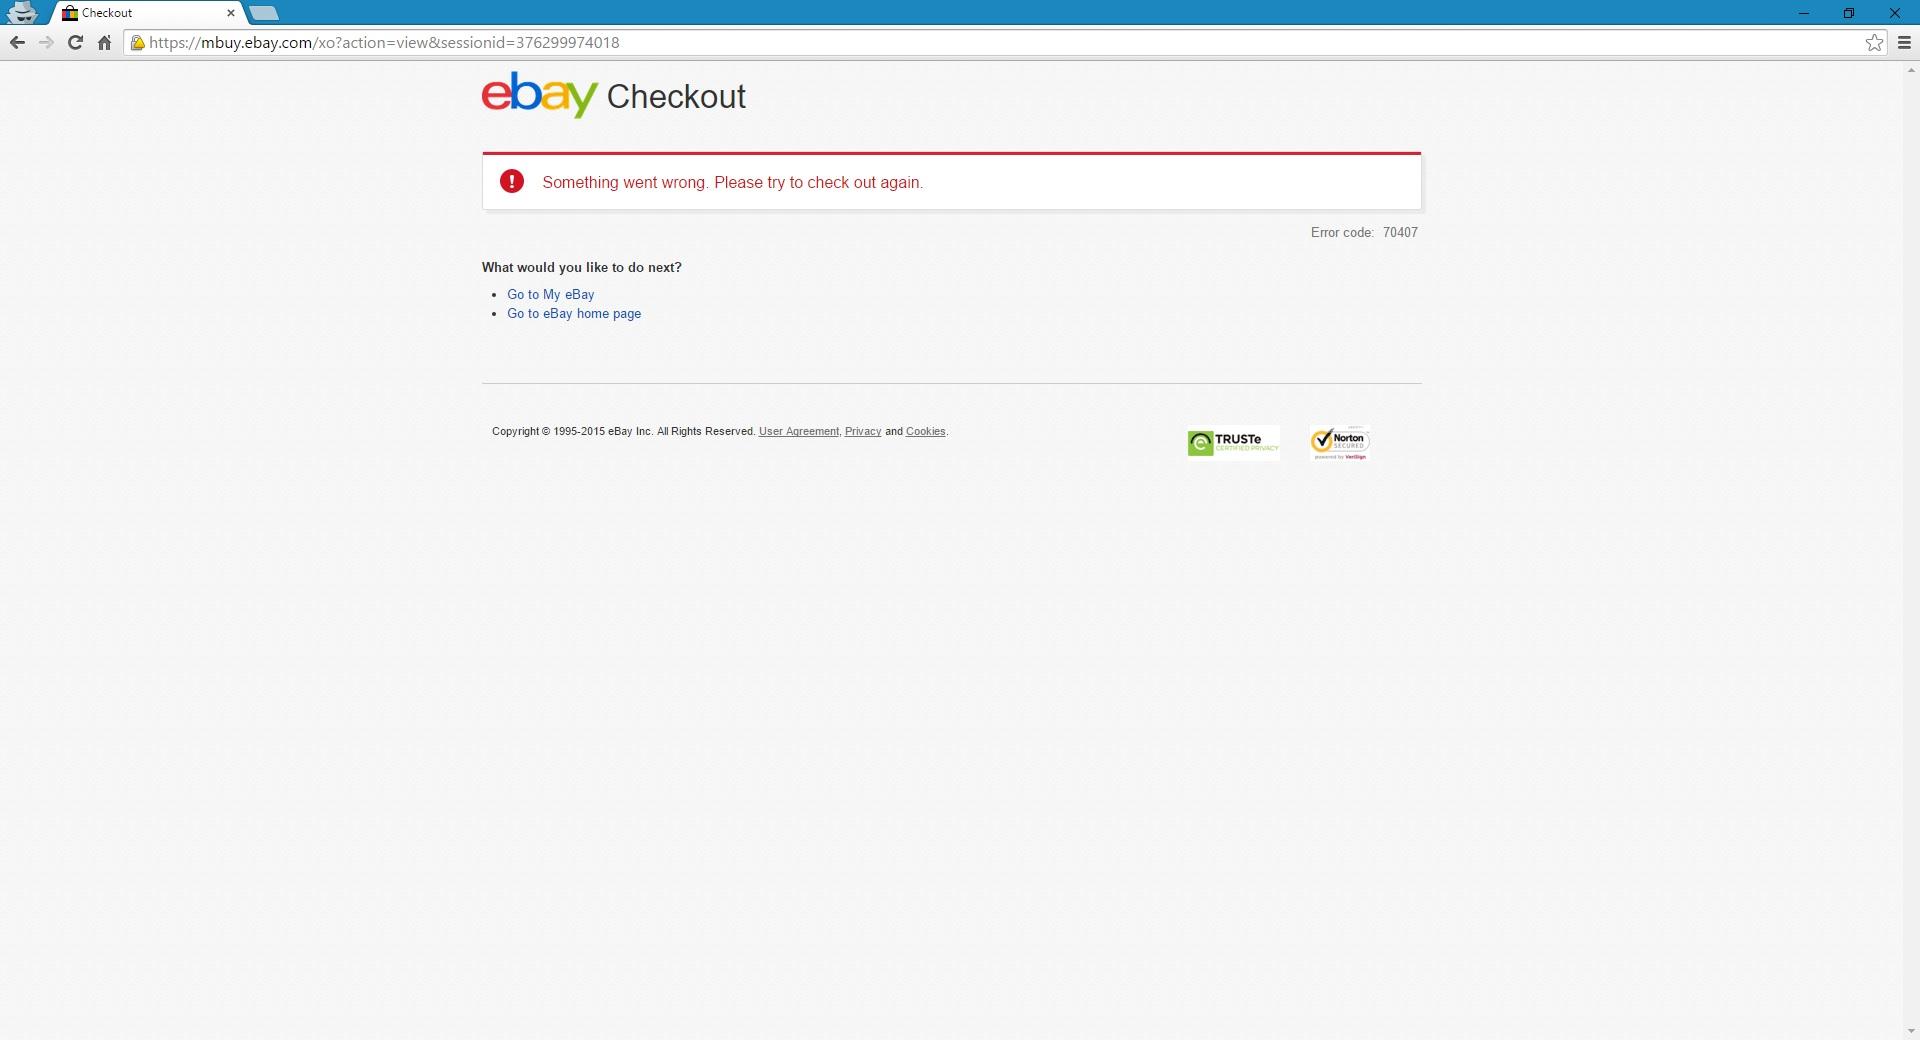 ebay iphone app paypal error